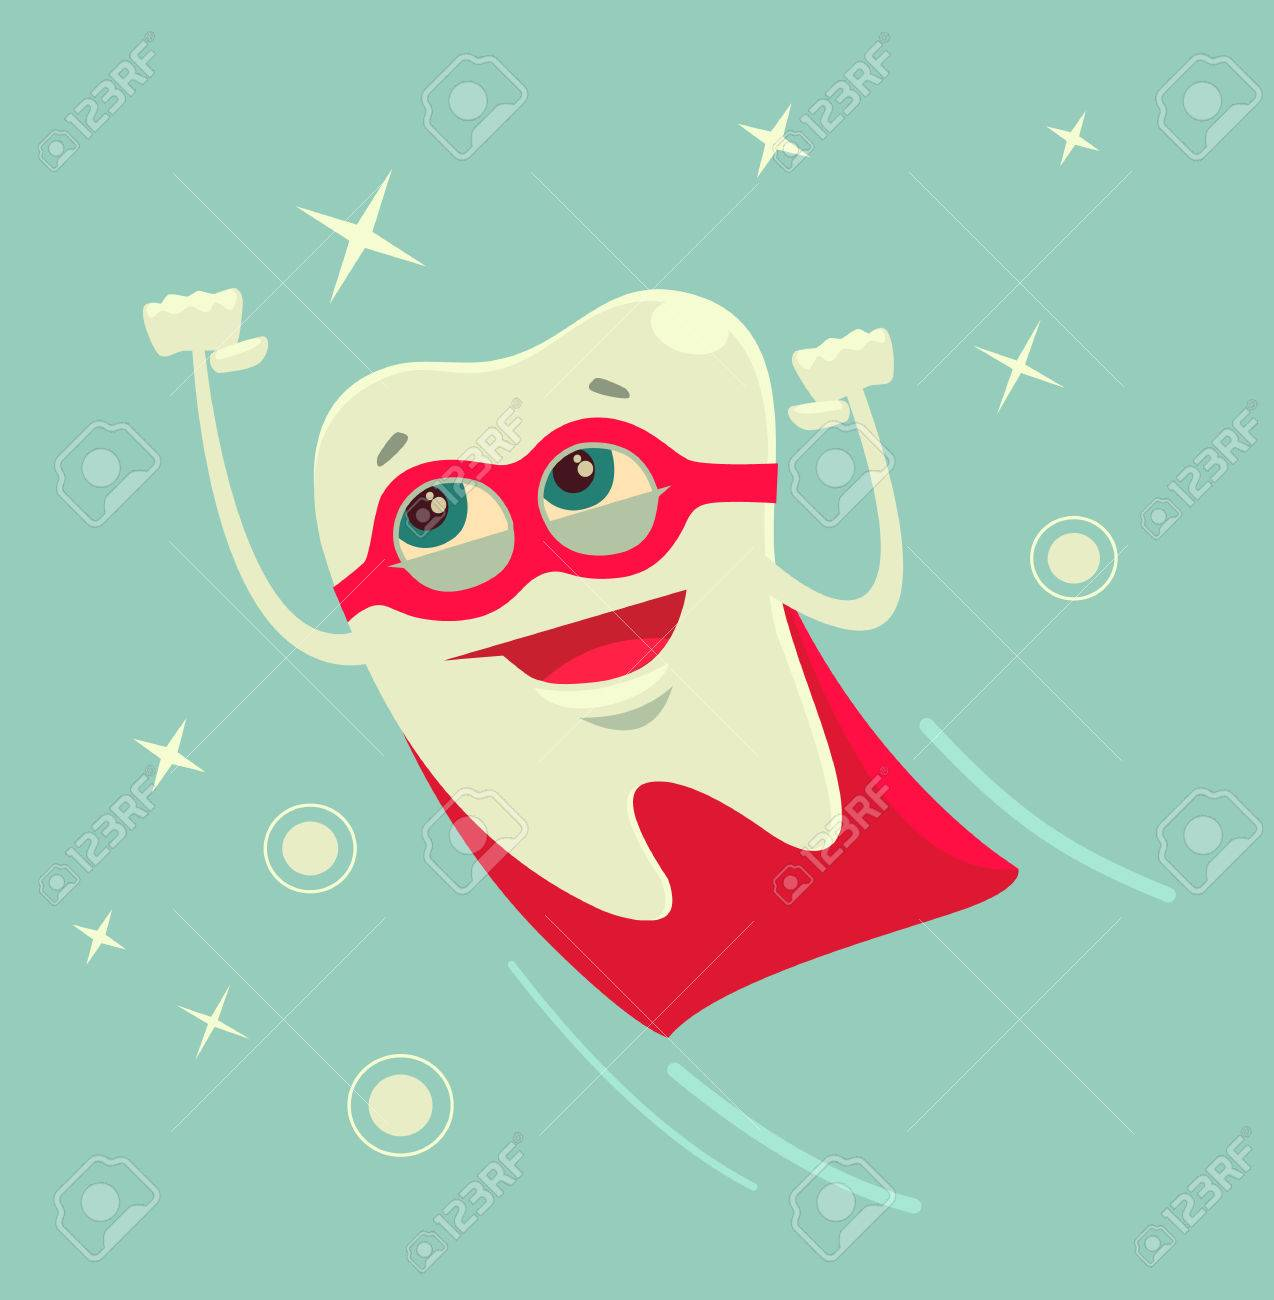 Superhero tooth character. Vector flat cartoon illustration - 62227228